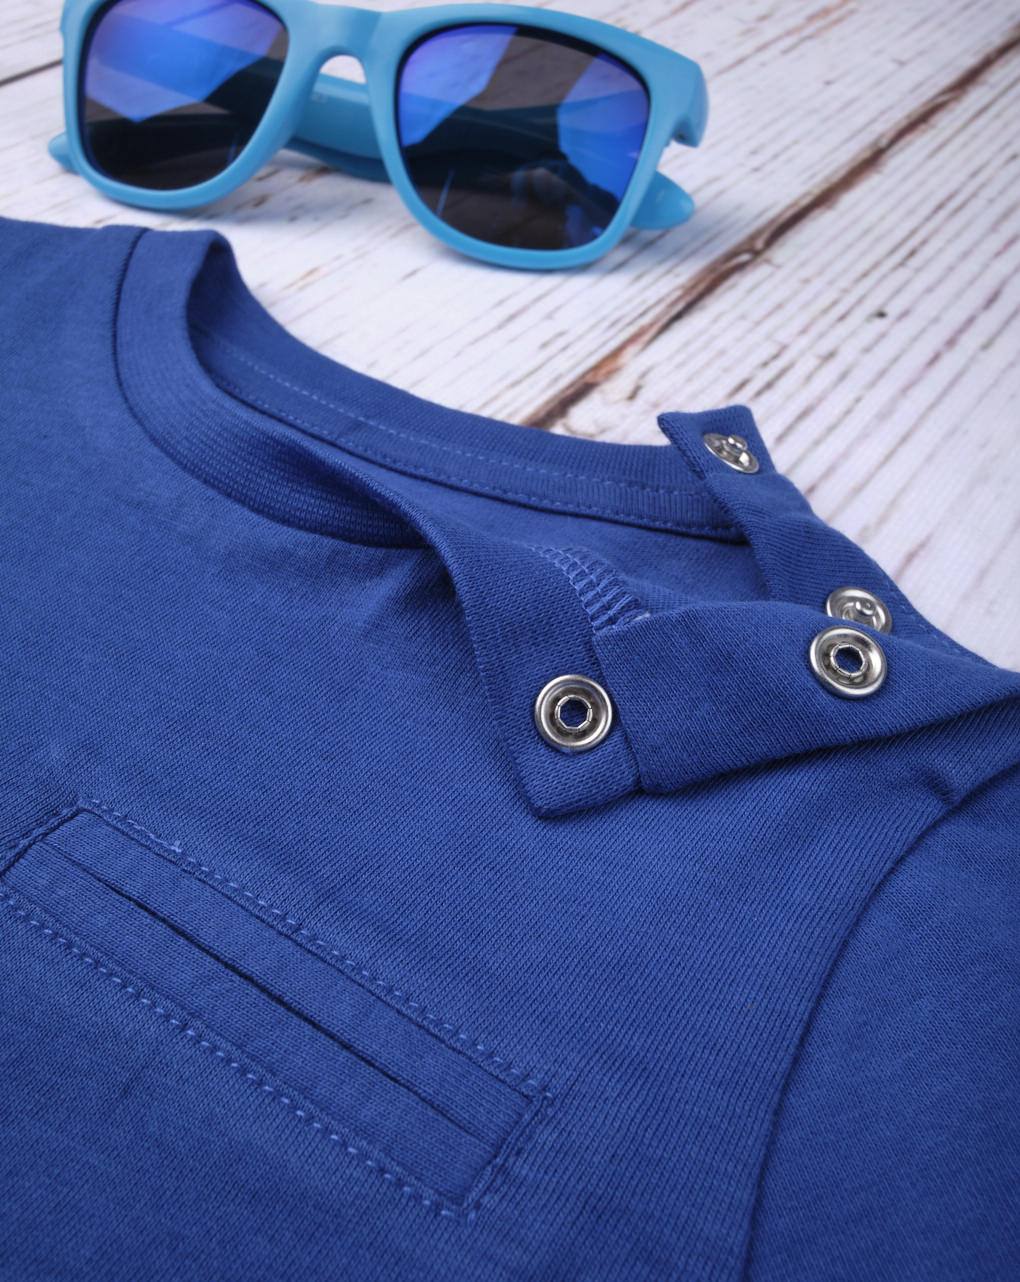 Camiseta menino azul - Prénatal